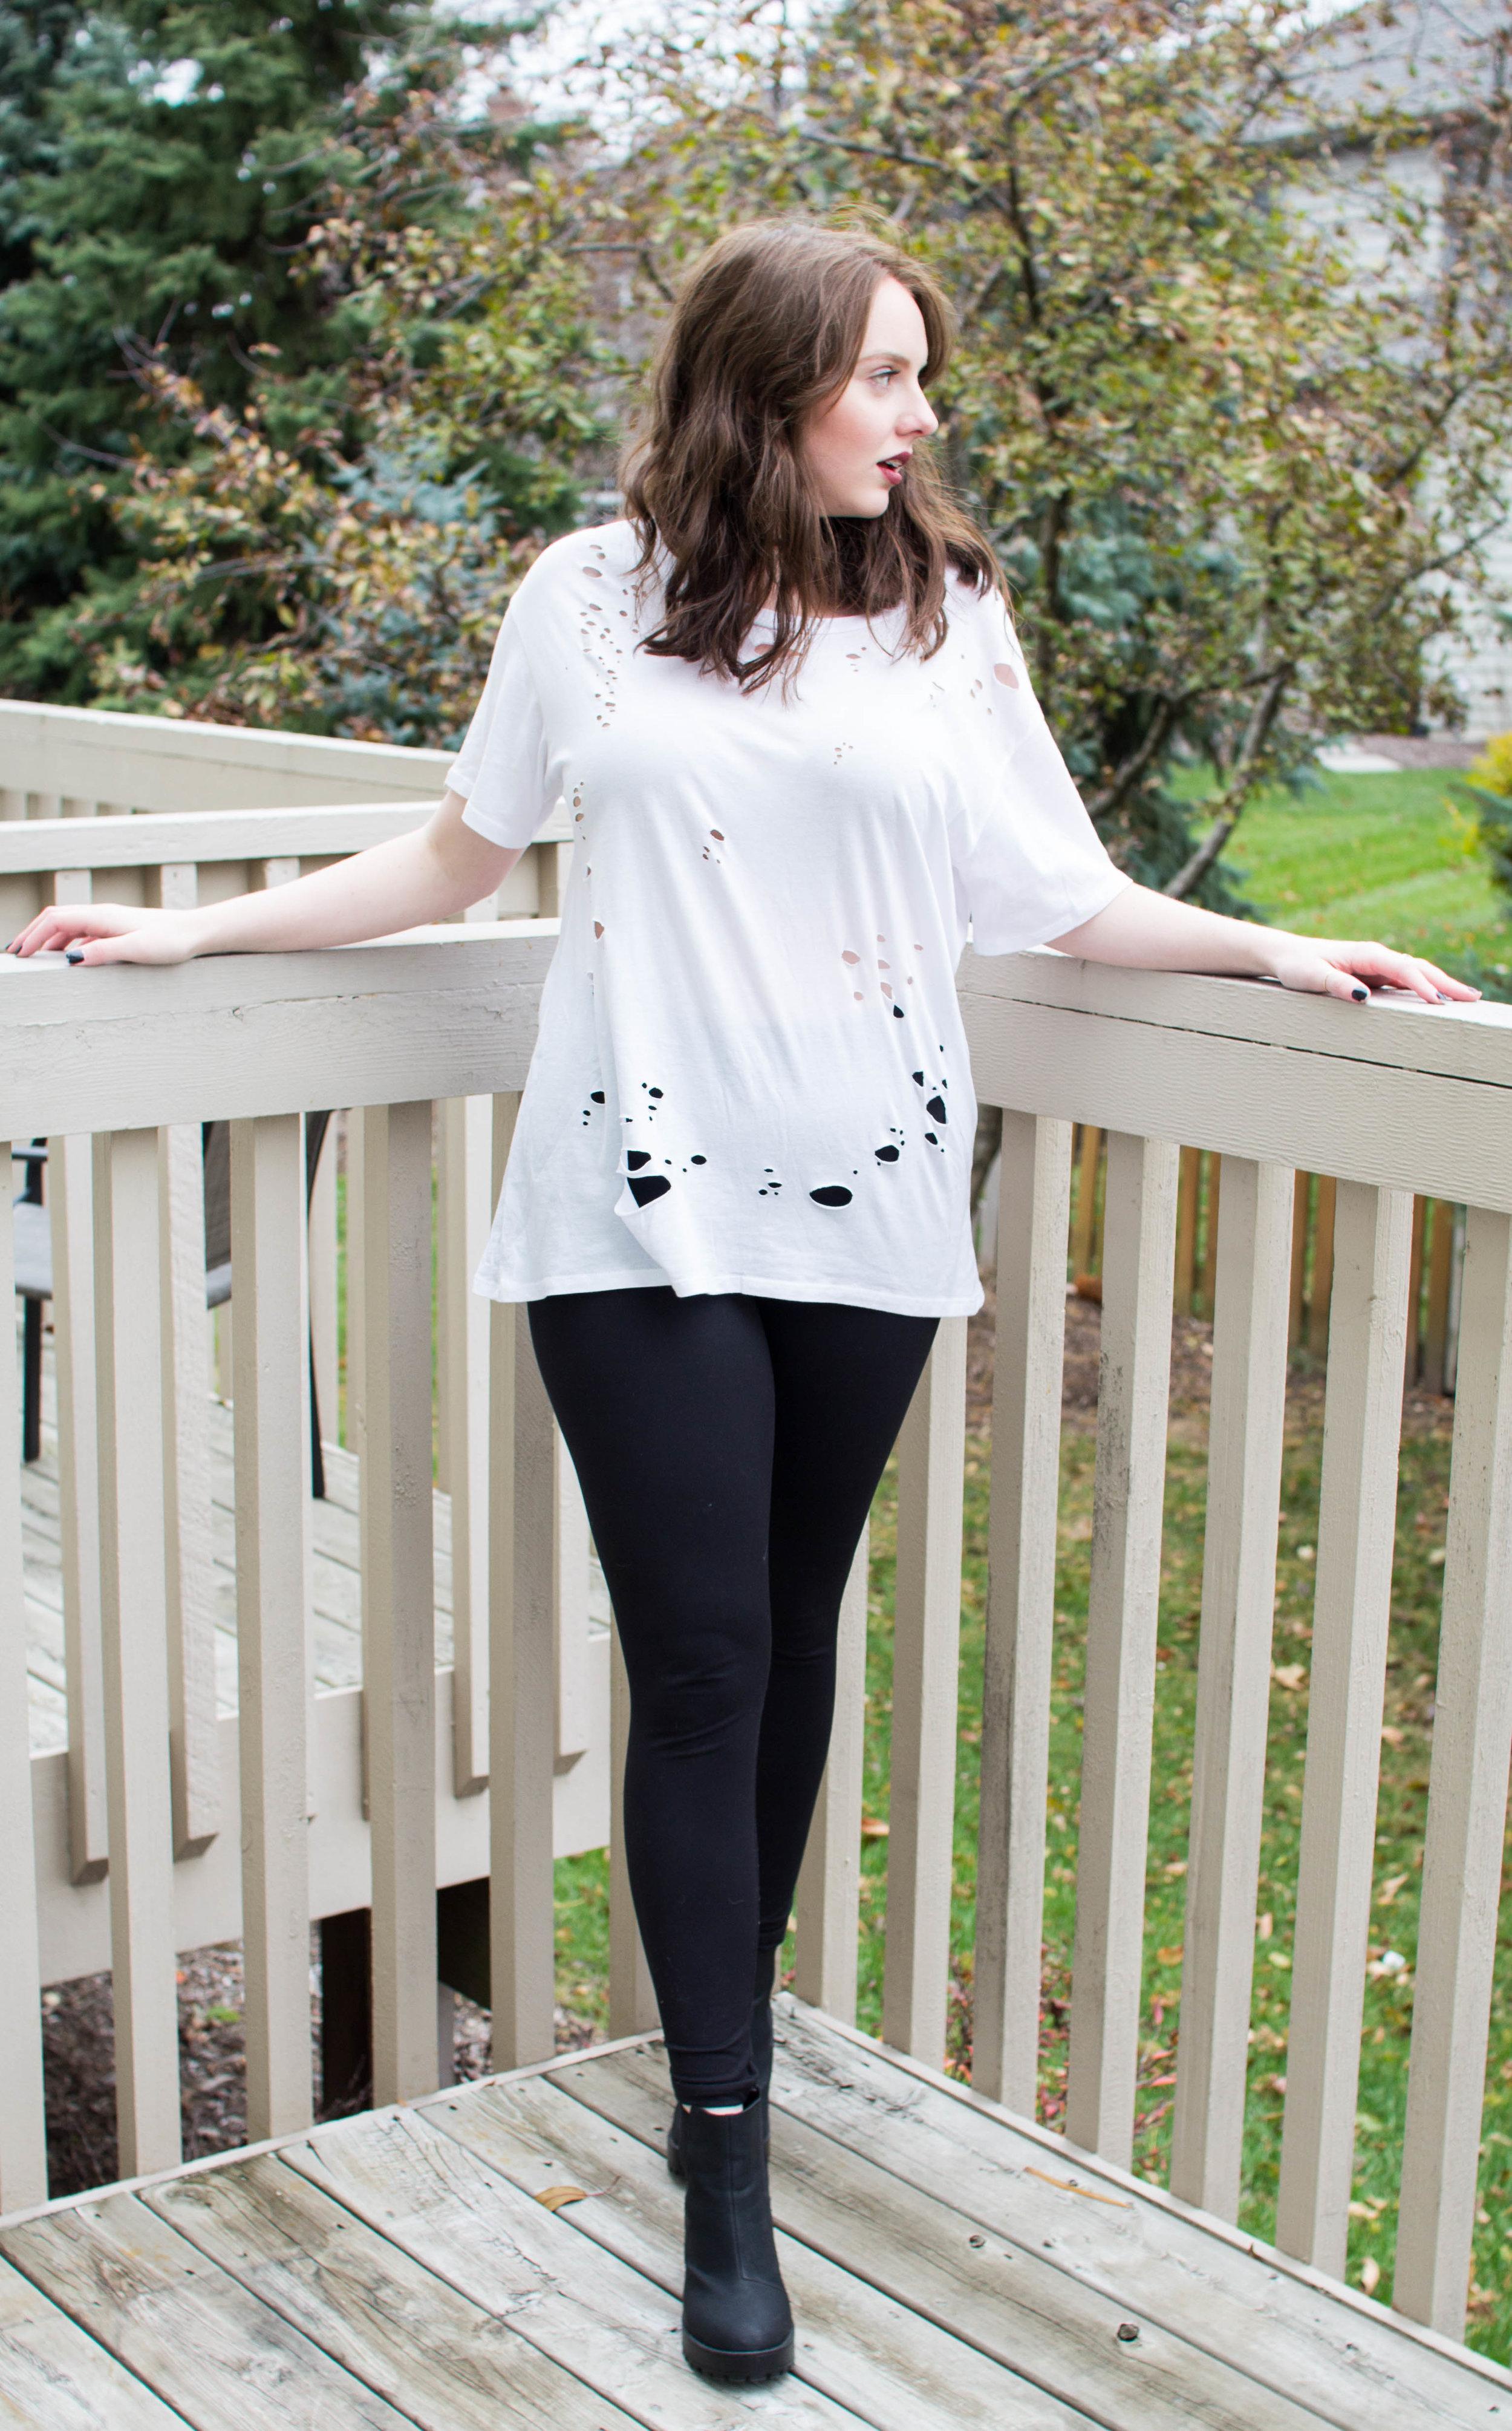 Macaila Britton Fashion Lookbook